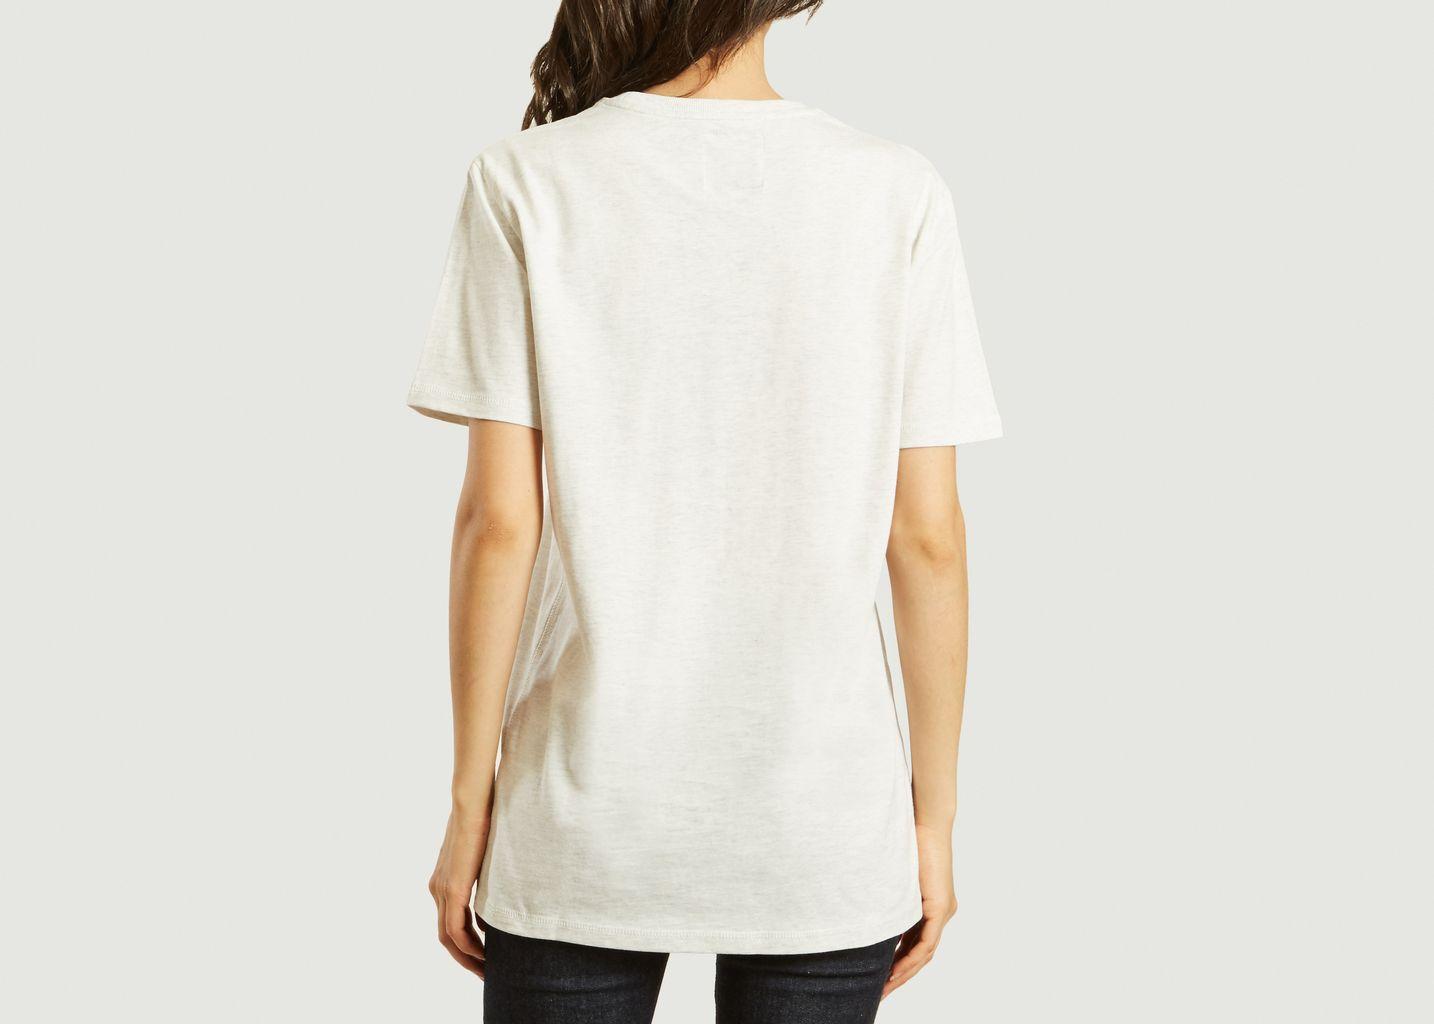 T-shirt Banane - Bricktown World